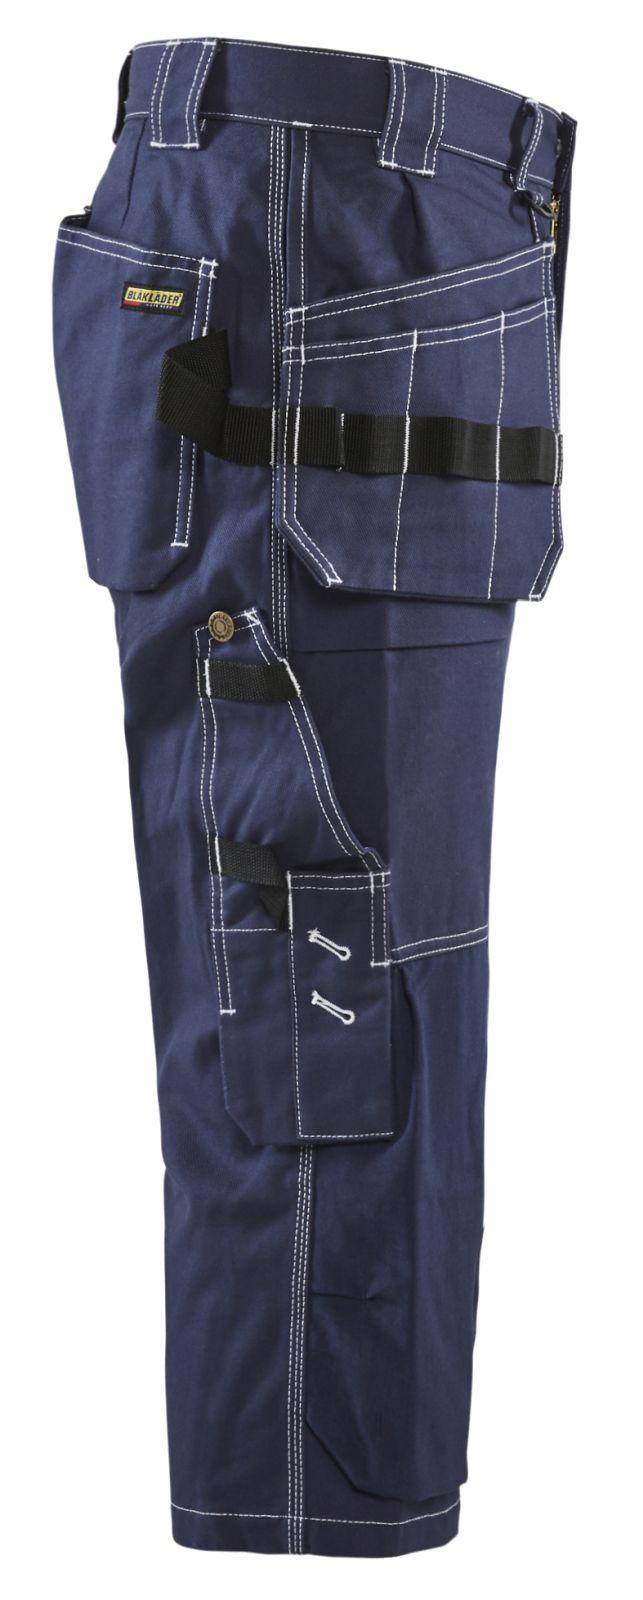 Blaklader Piraatbroeken 15401370 marineblauw(8800)